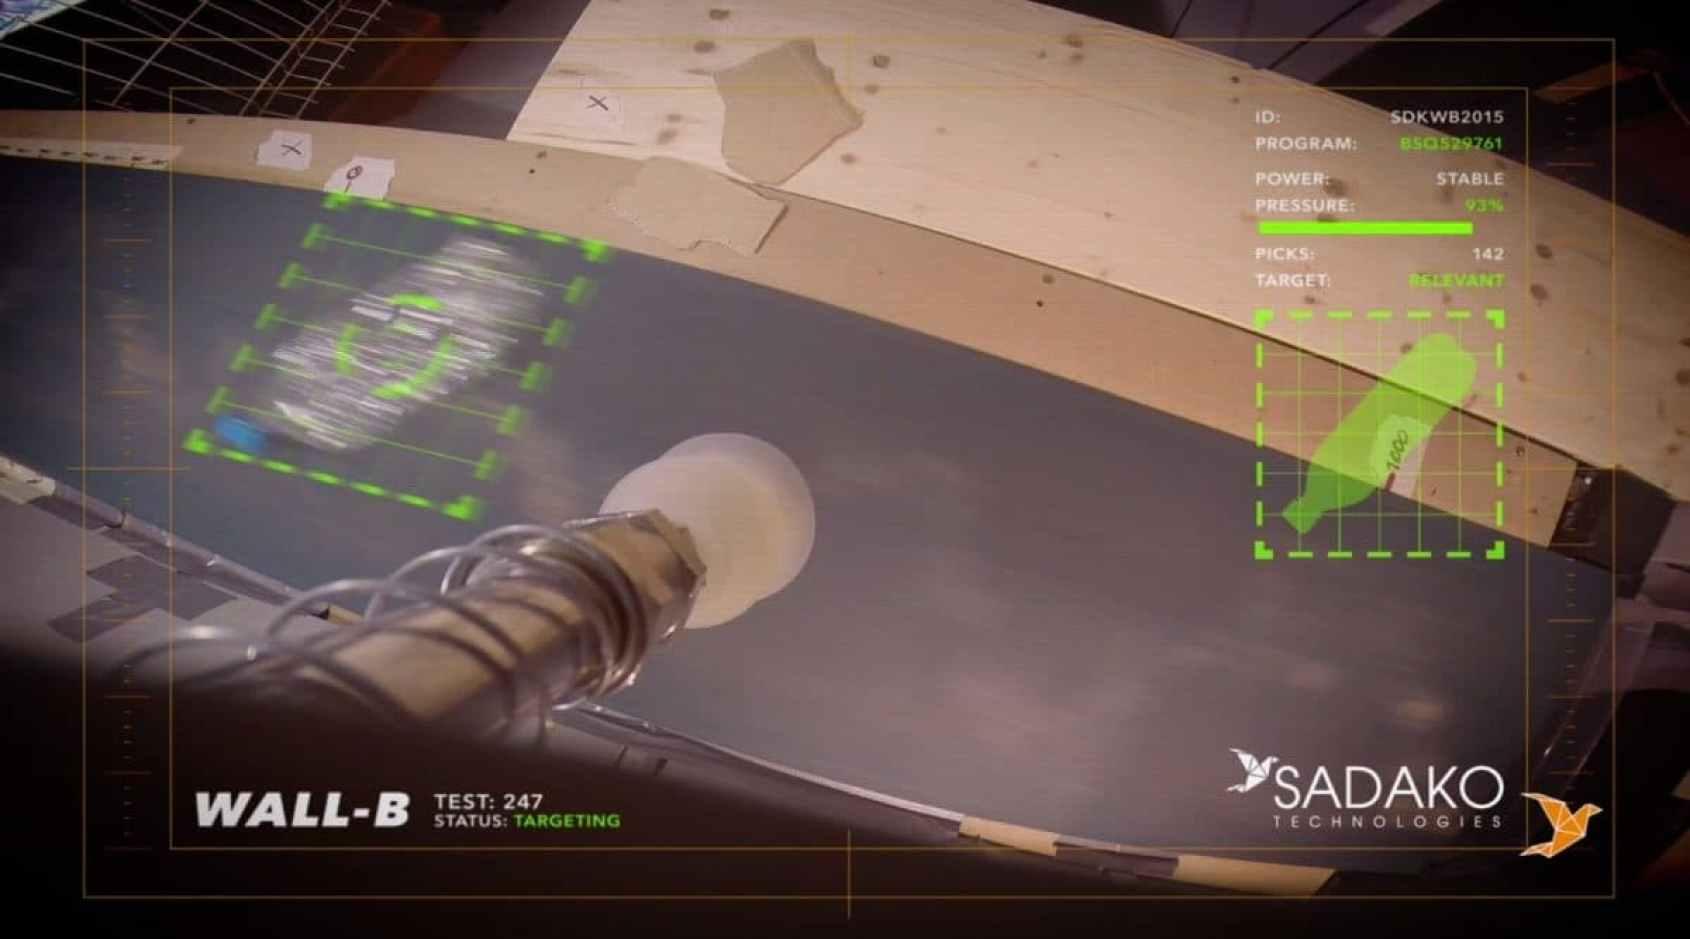 Wall-B, el robot que quiere revolucionar la industria del reciclaje